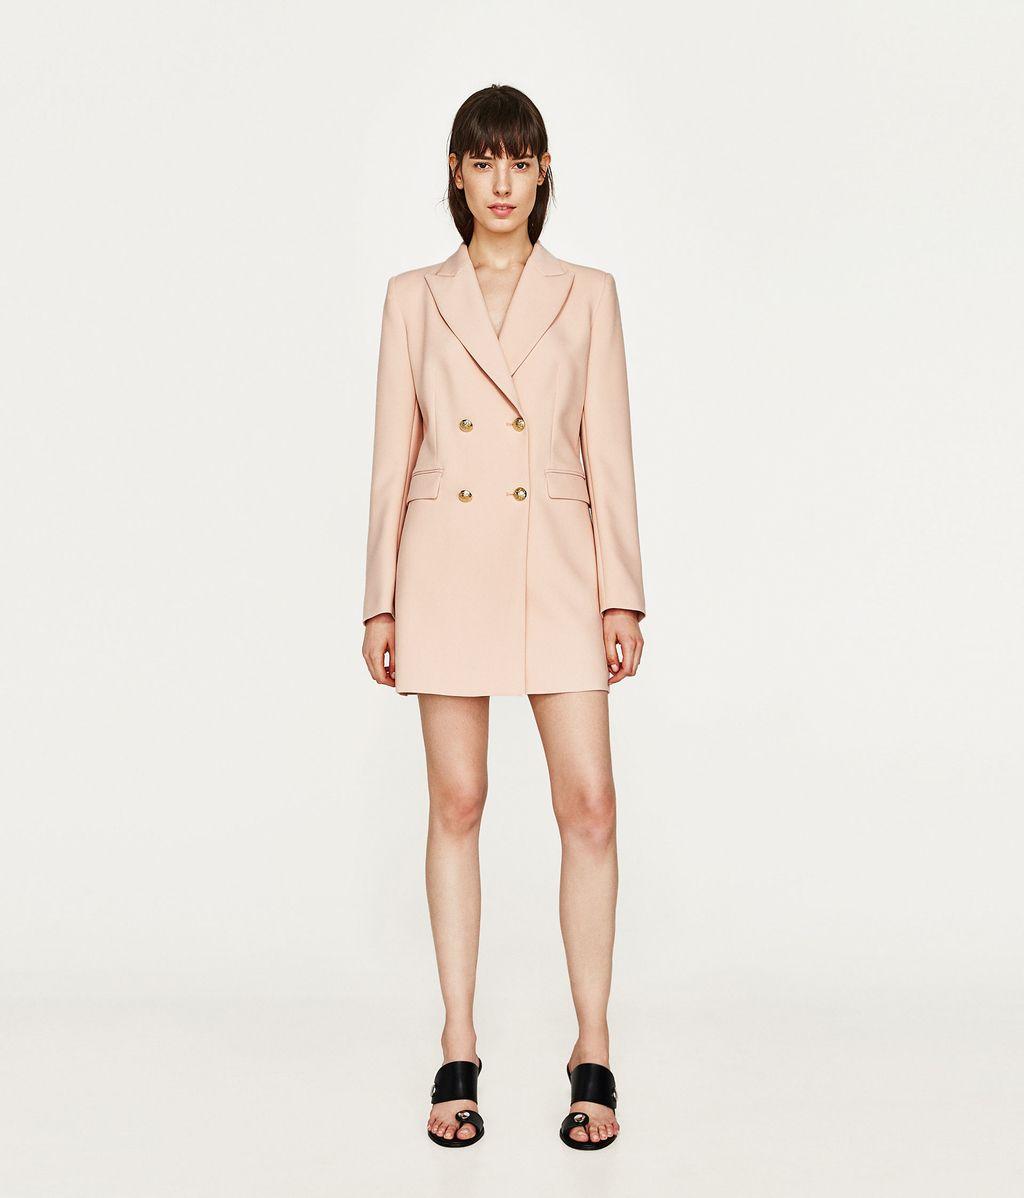 Blazer-vestido de Zara